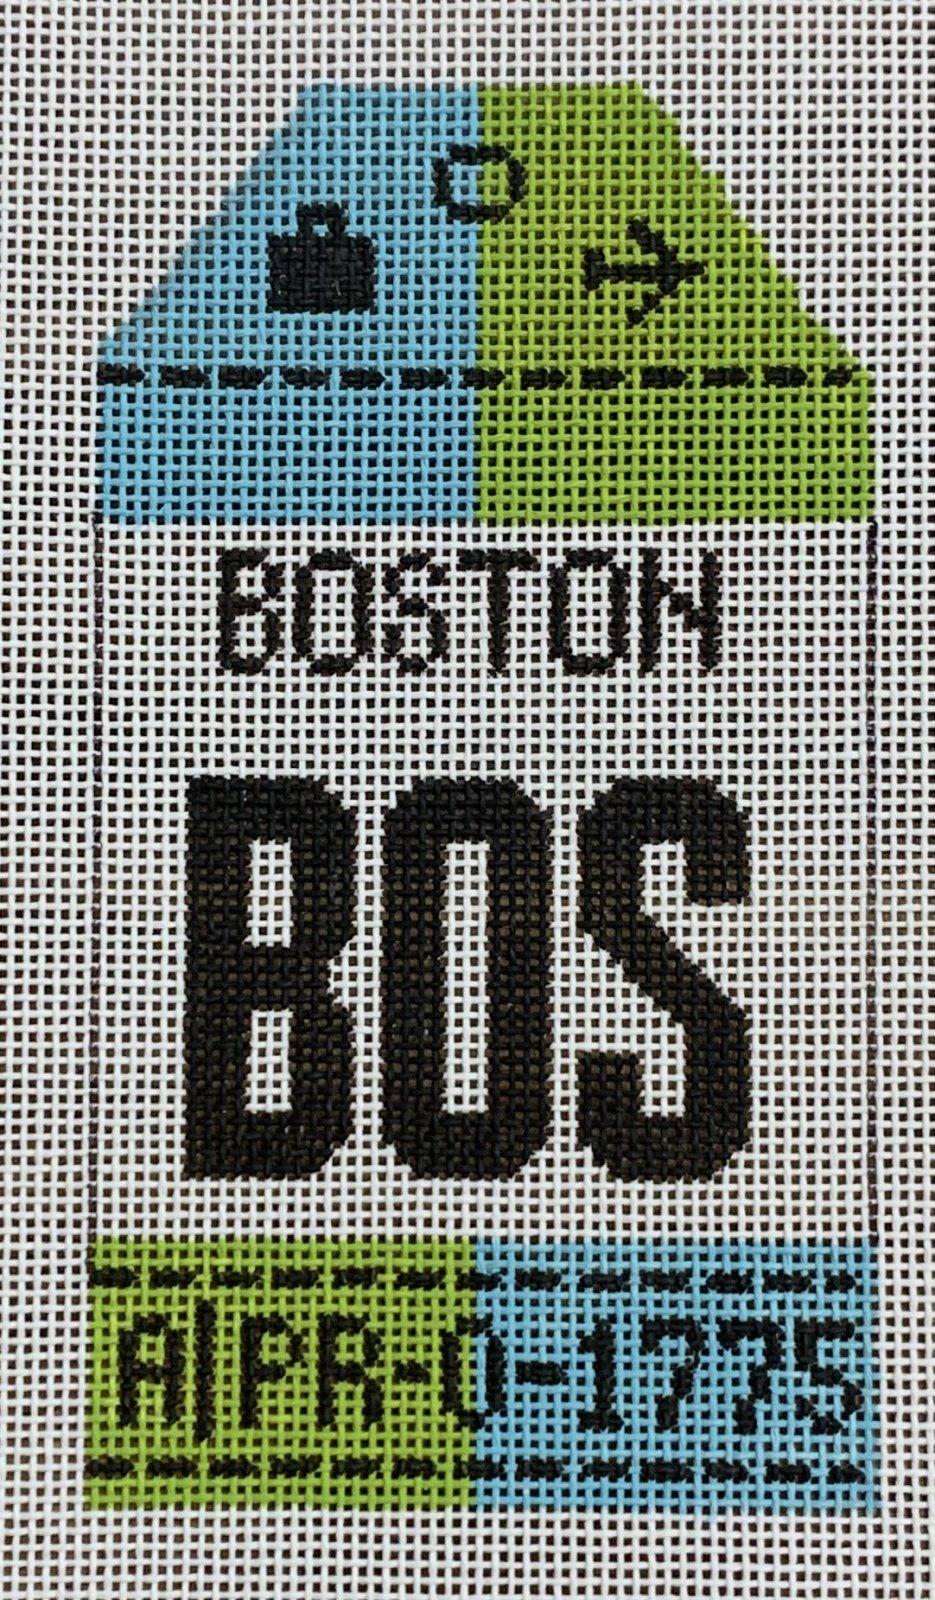 Vintage Luggage Tag - Boston